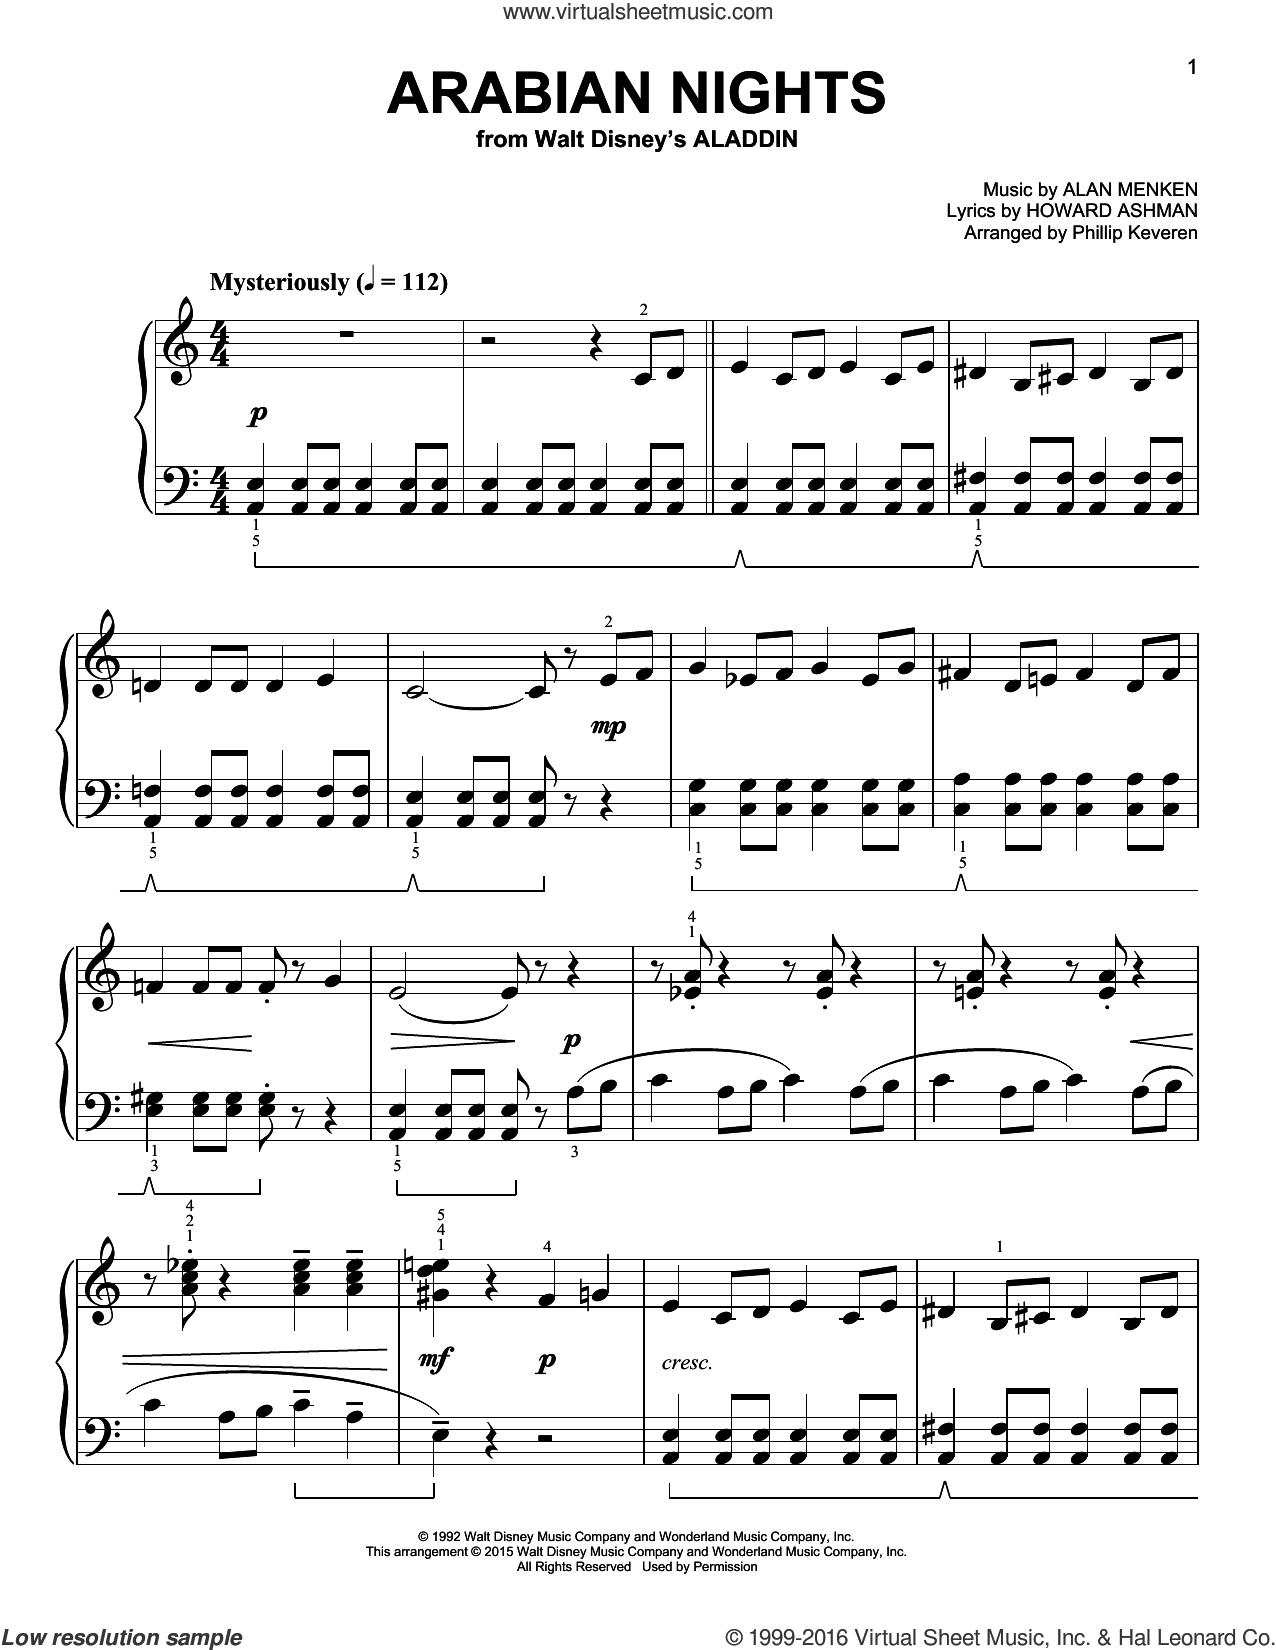 Arabian Nights [Classical version] (from Aladdin) (arr. Phillip Keveren) sheet music for piano solo by Alan Menken, Phillip Keveren and Howard Ashman, easy skill level